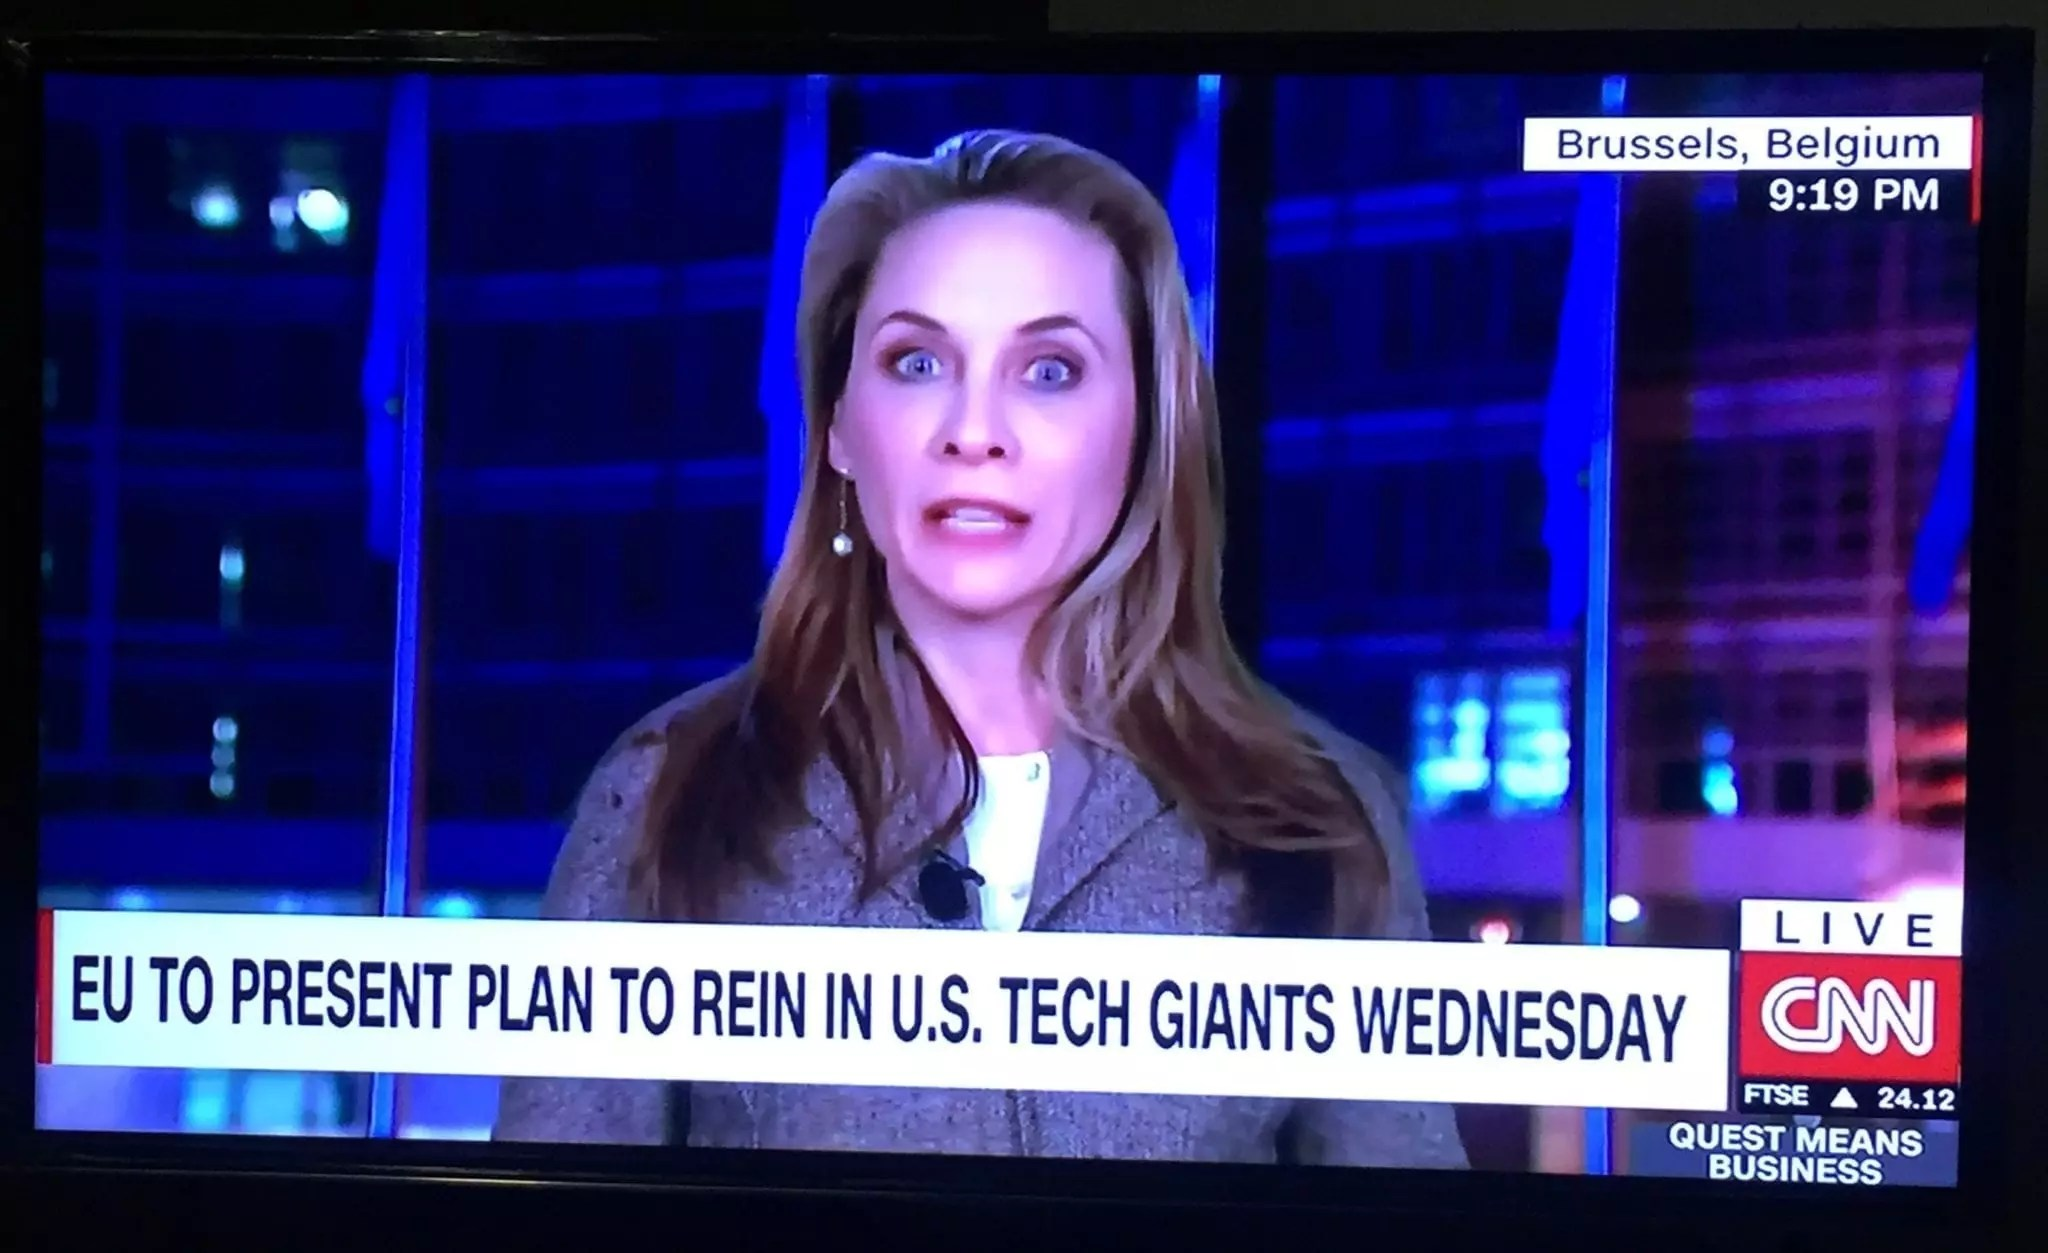 eNitiate | CNN | EU to Regulate | Big Tech Companies | 17 February 2020